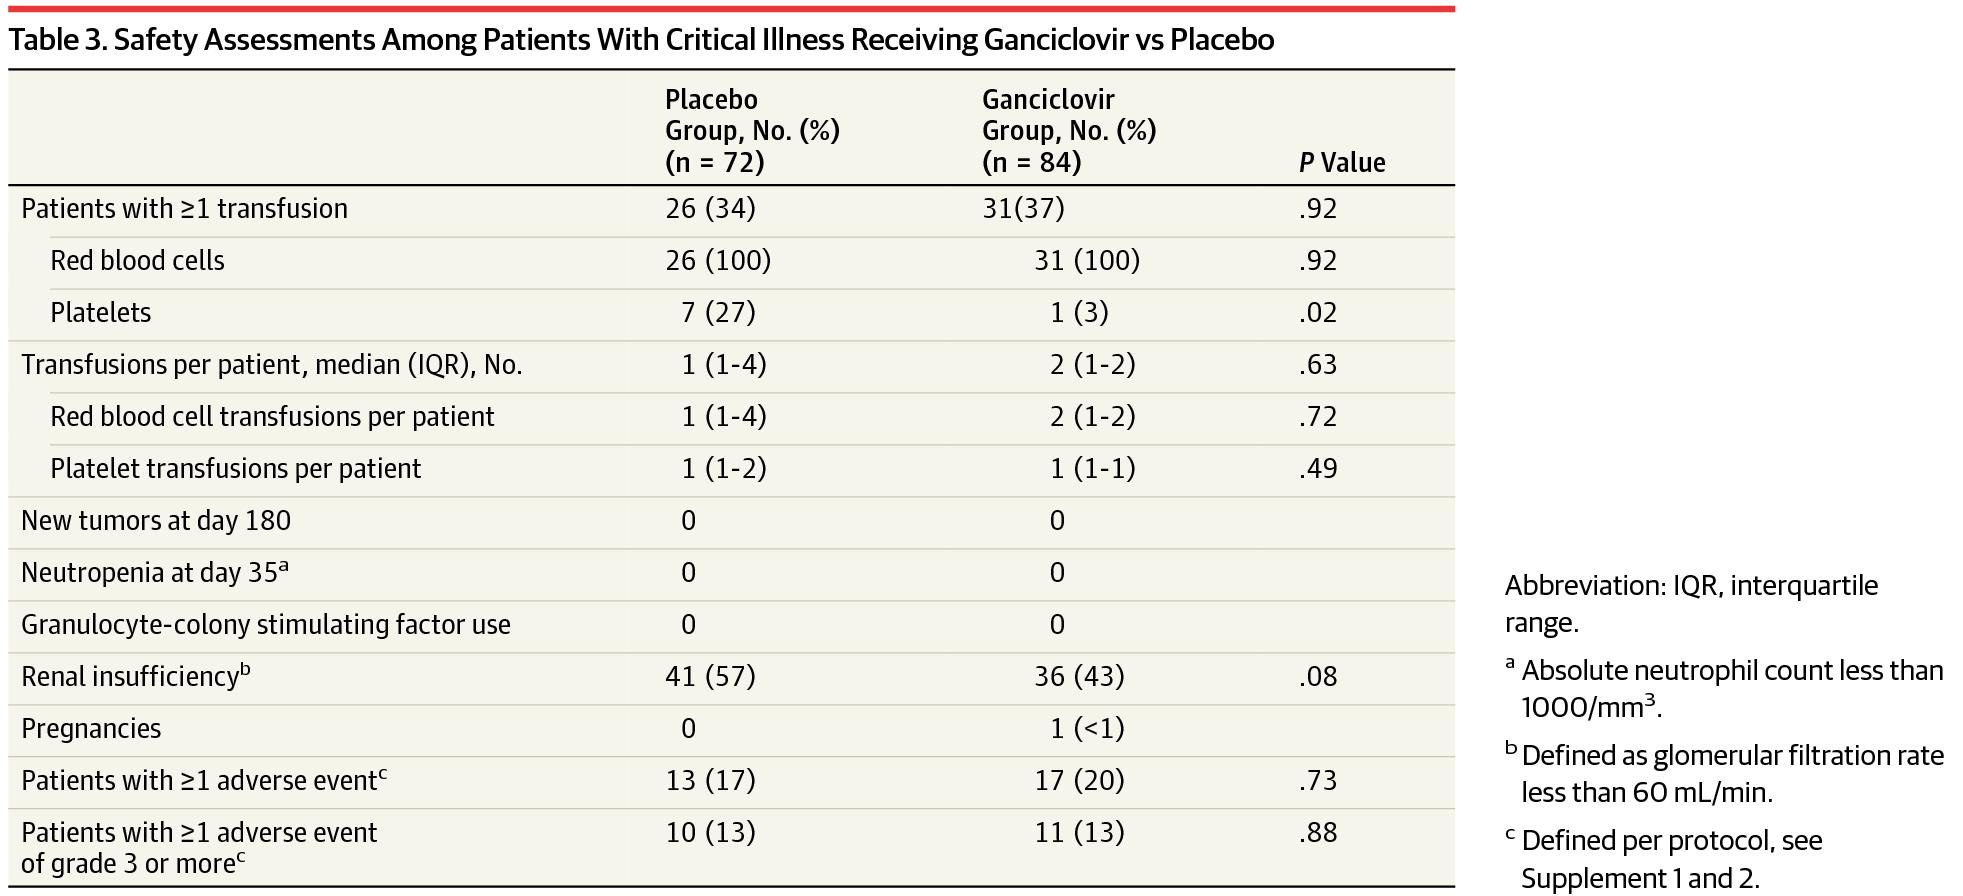 [JAMA最新论文]:更昔洛韦不能降低CMV血清阳性成年危重病患者的IL-6水平